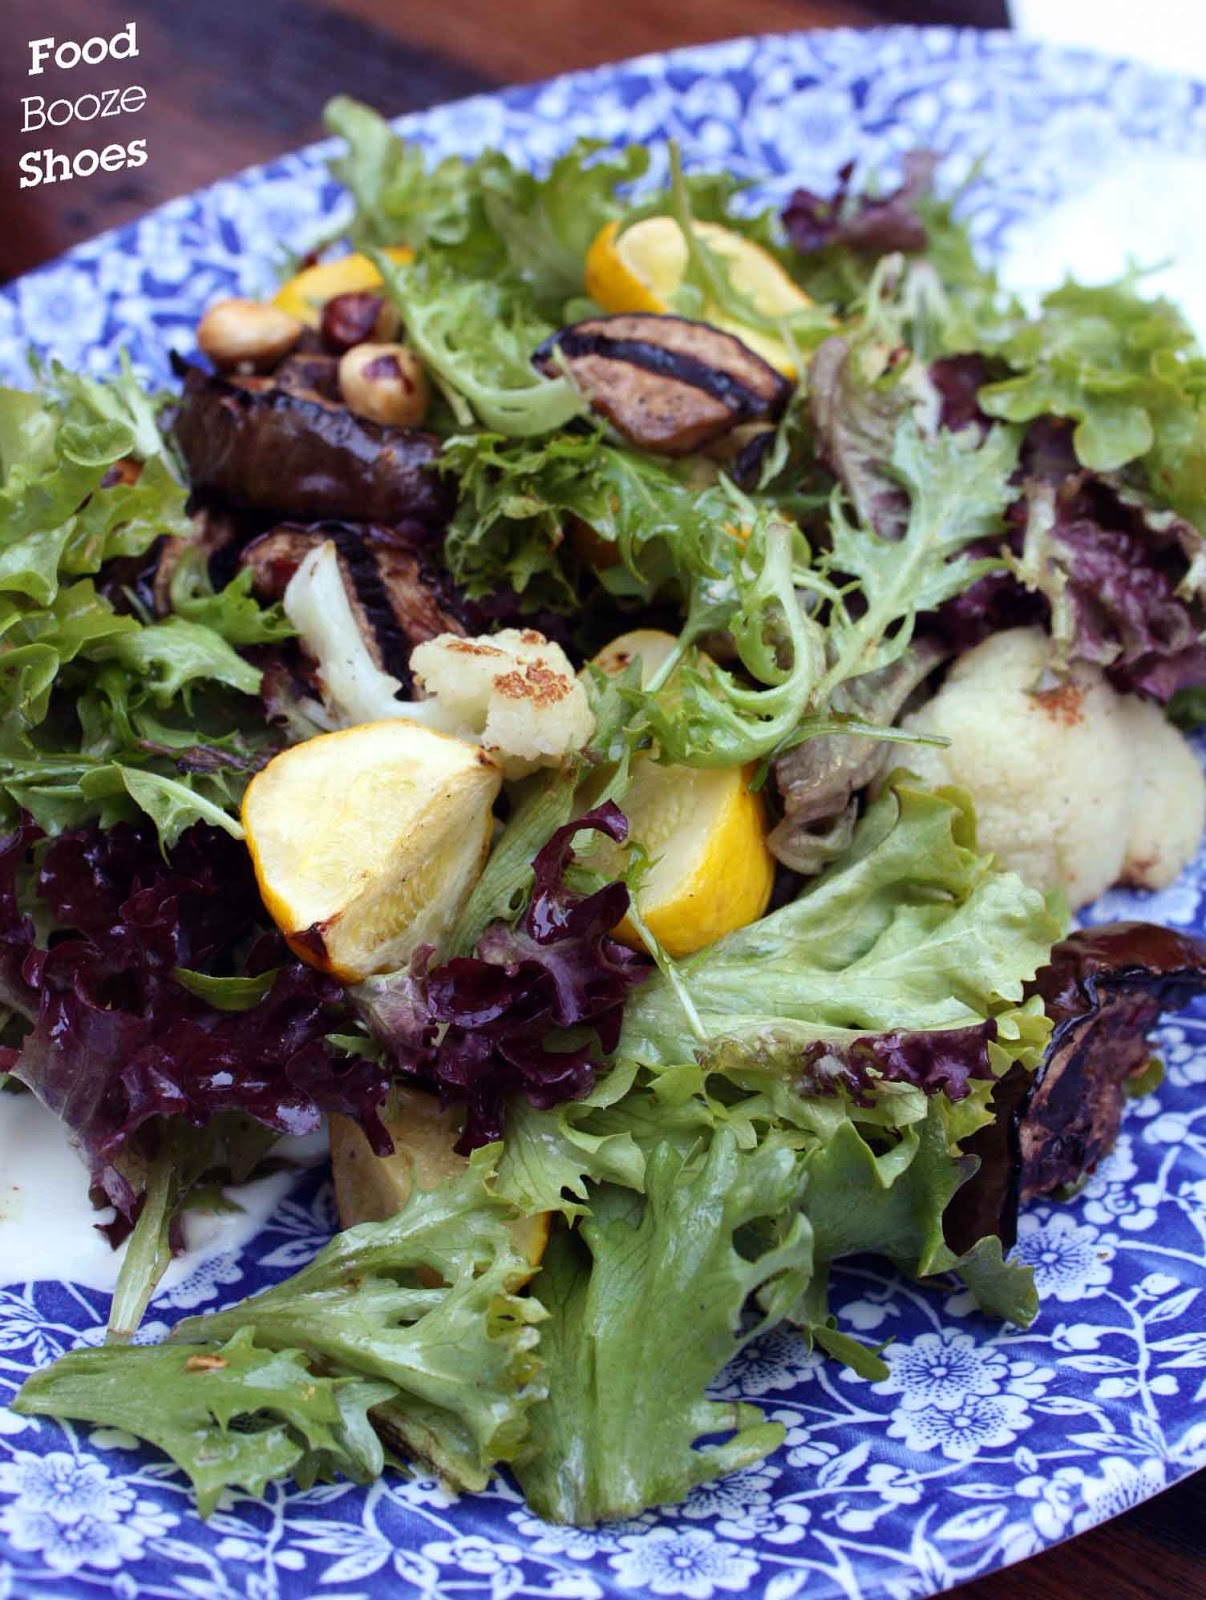 Spiced eggplant, cauliflower, hazelnut, herbs, yoghurt